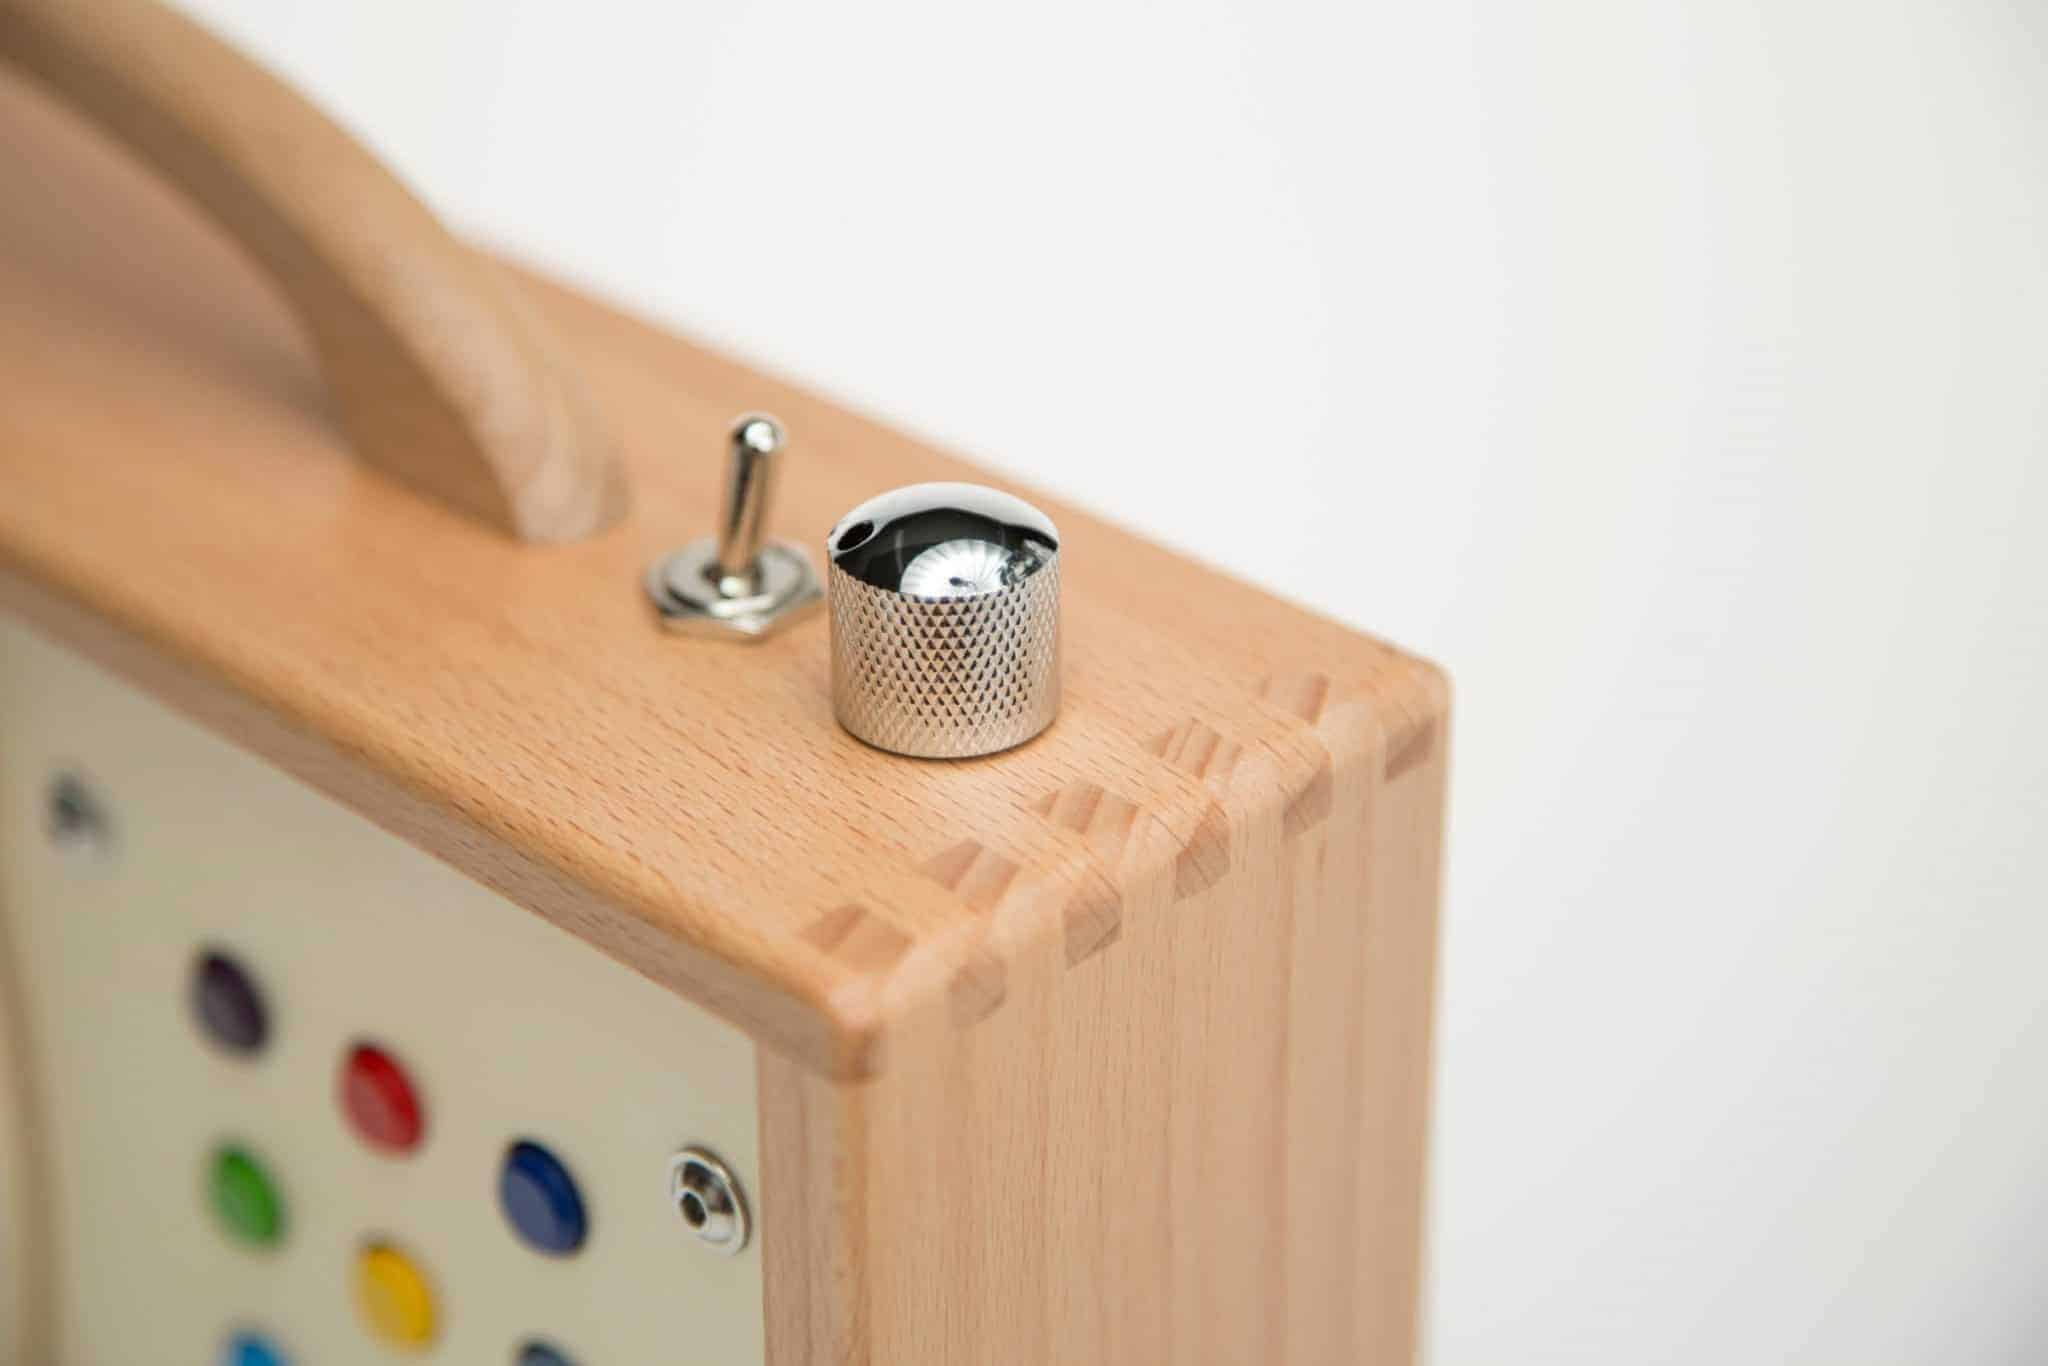 hoerbert's volume knob